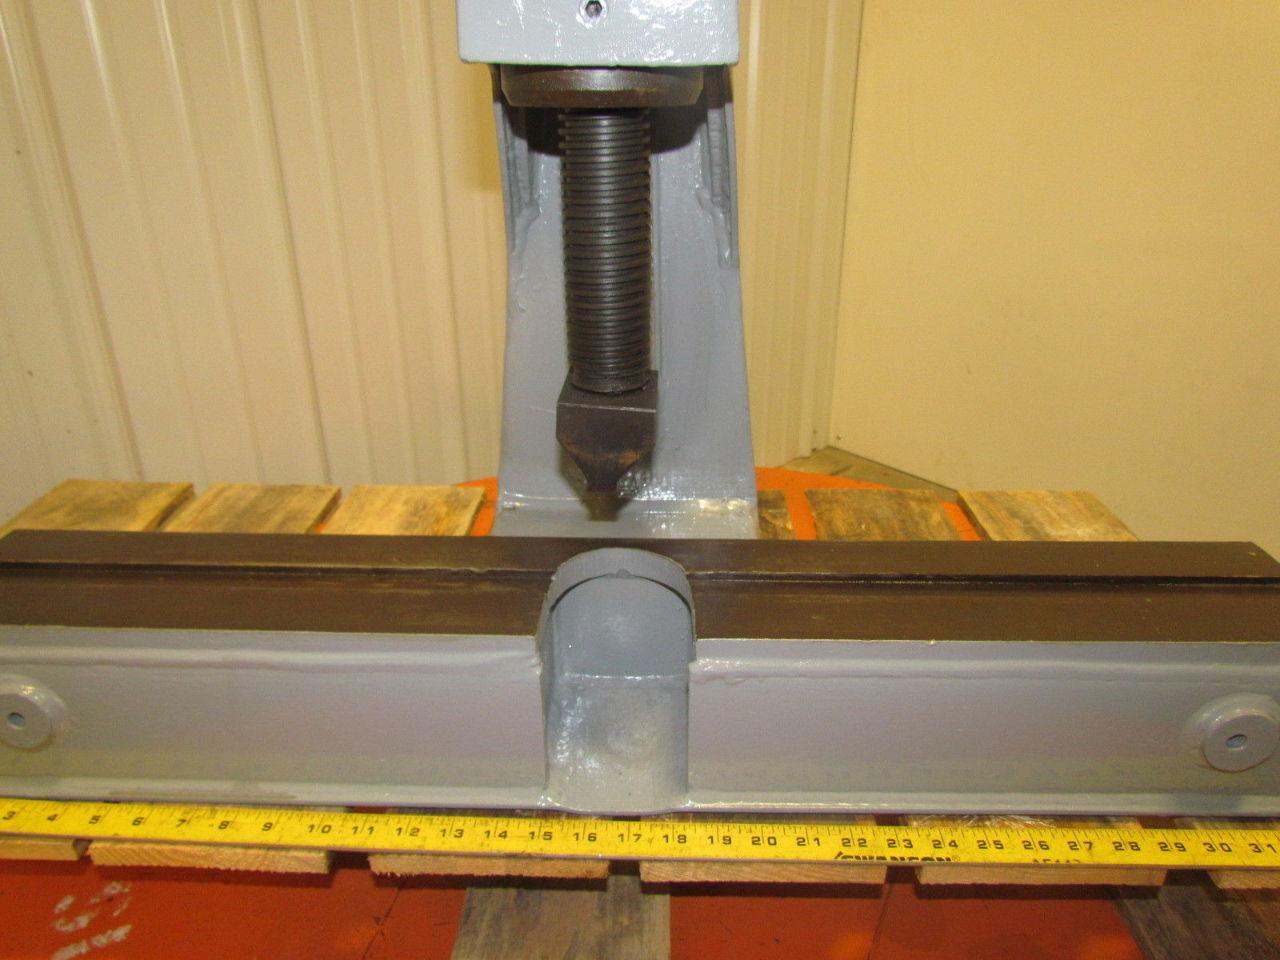 Dake 36 R Bench Mounted Straightening Heavy Duty Arbor